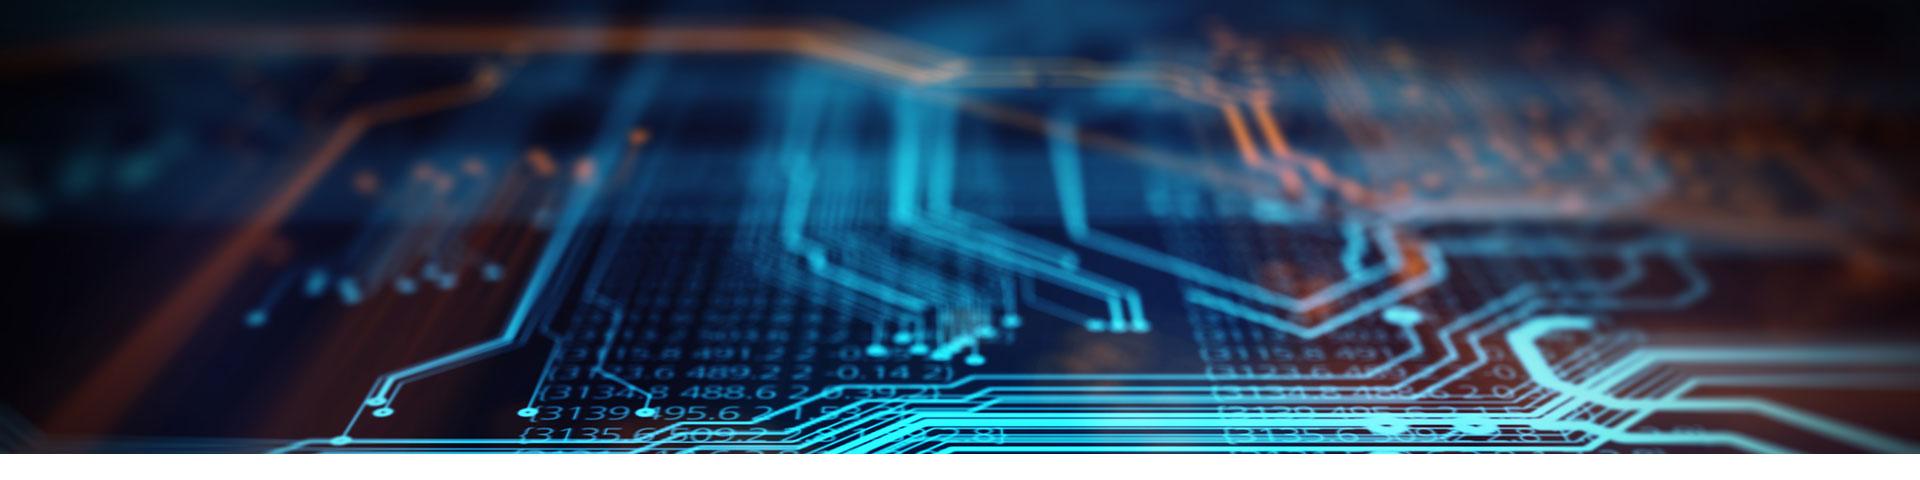 promwad FPGA design services